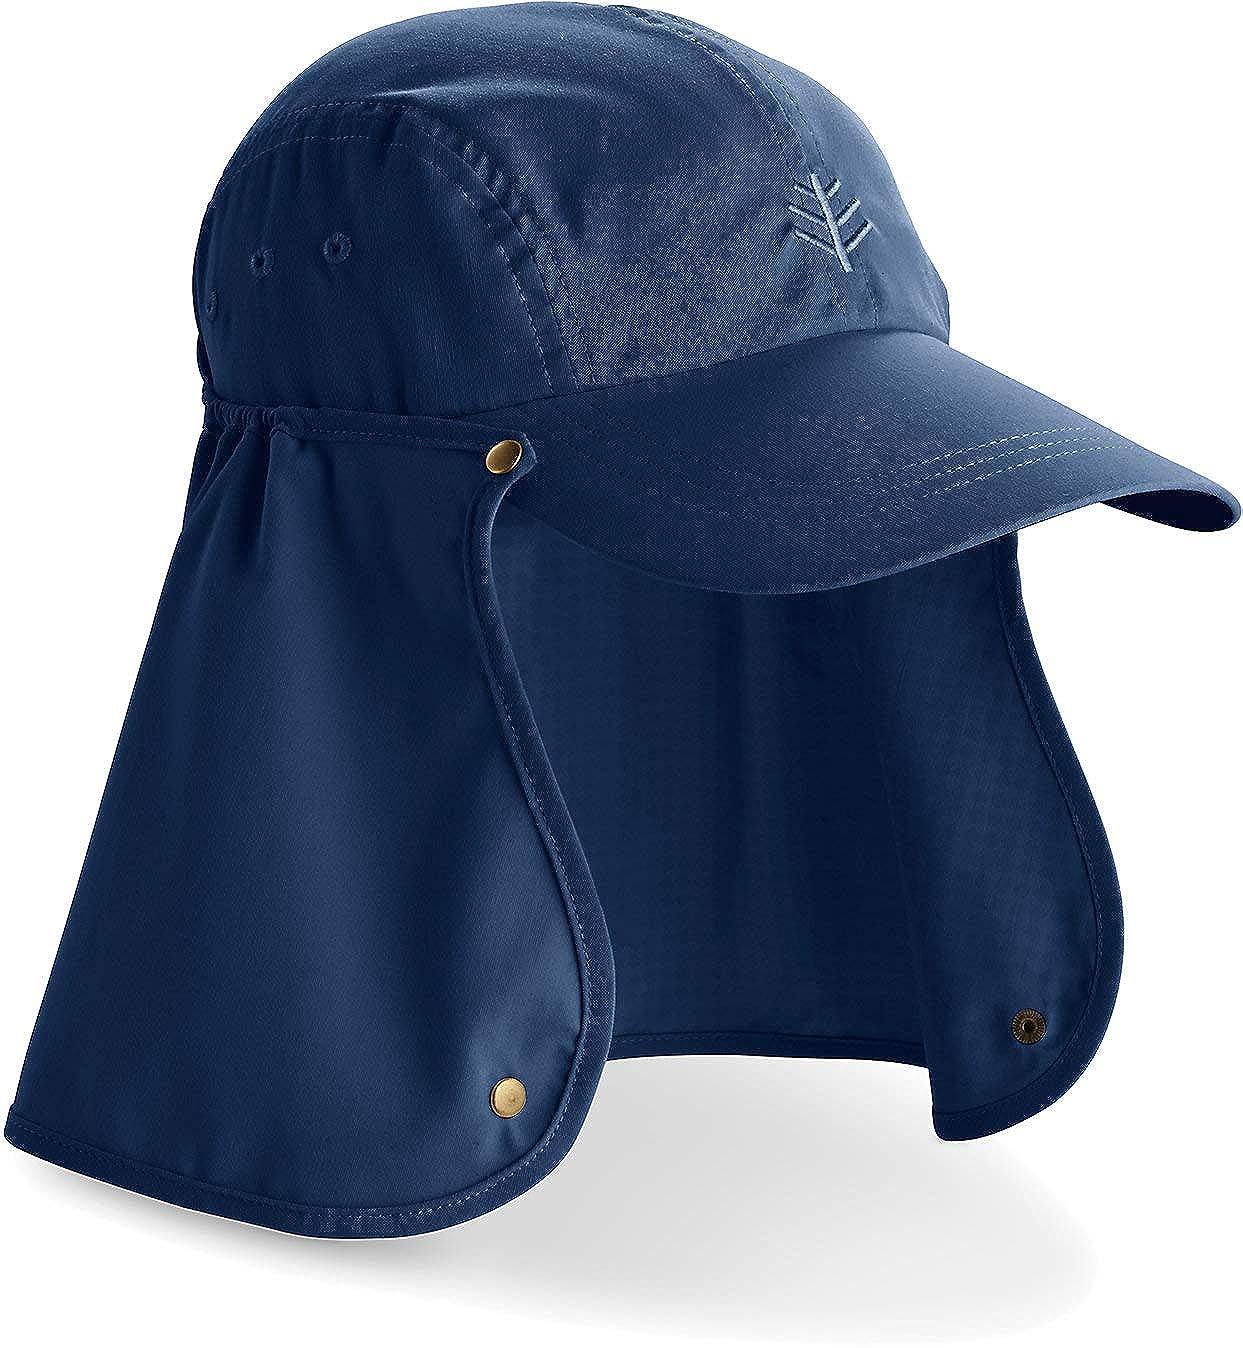 9f515b96a Coolibar UPF 50+ Men's Super Sport Hat - Sun Protective